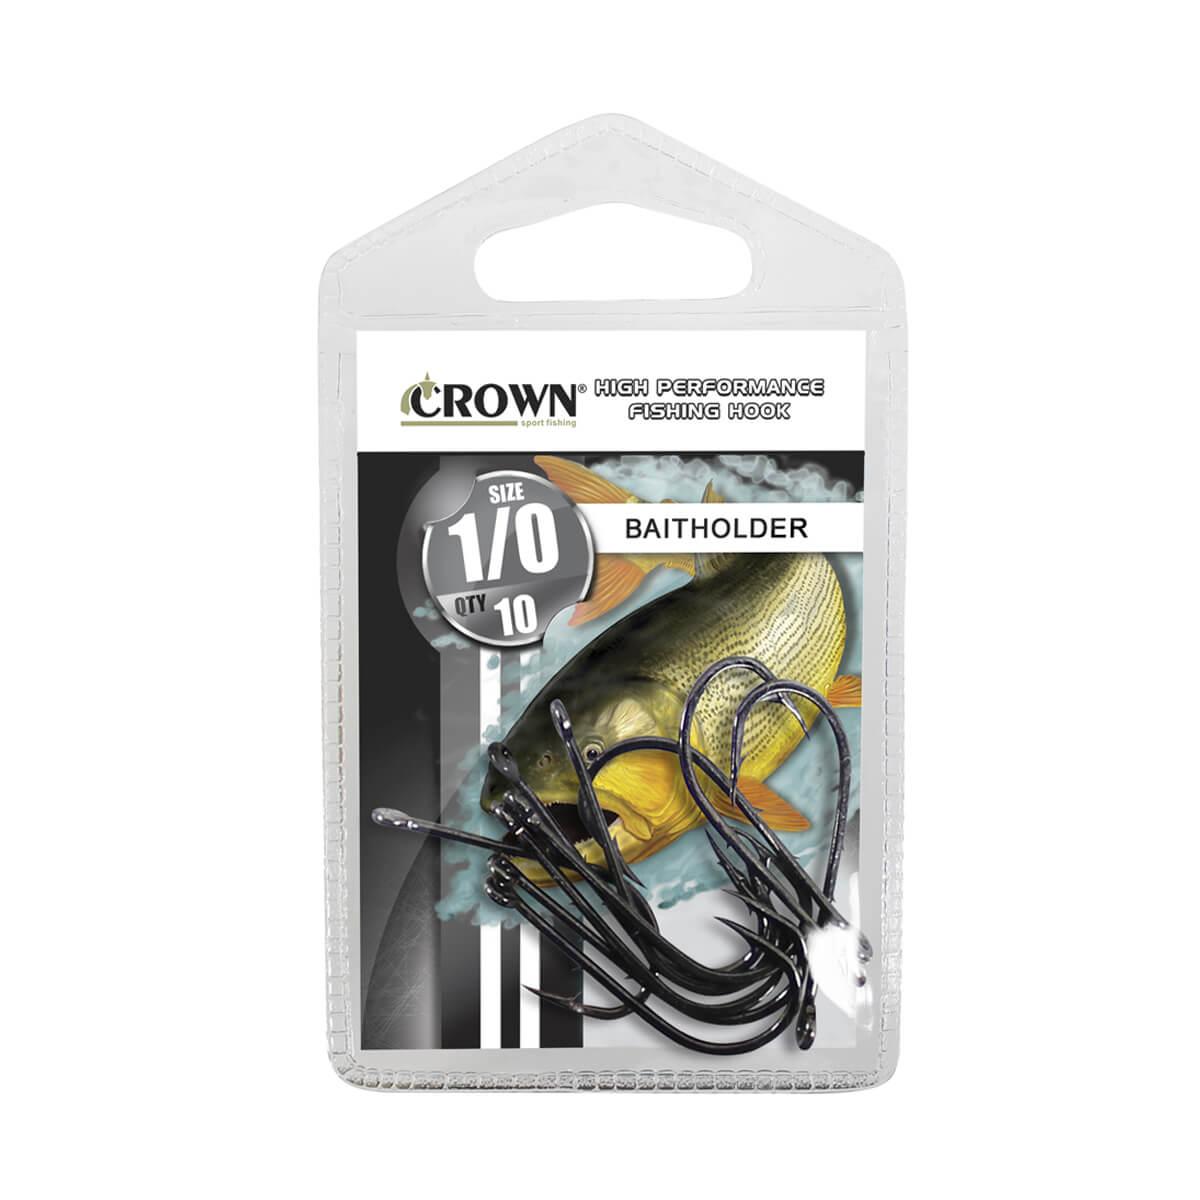 Anzol Crown Baitholder Black  - Pró Pesca Shop